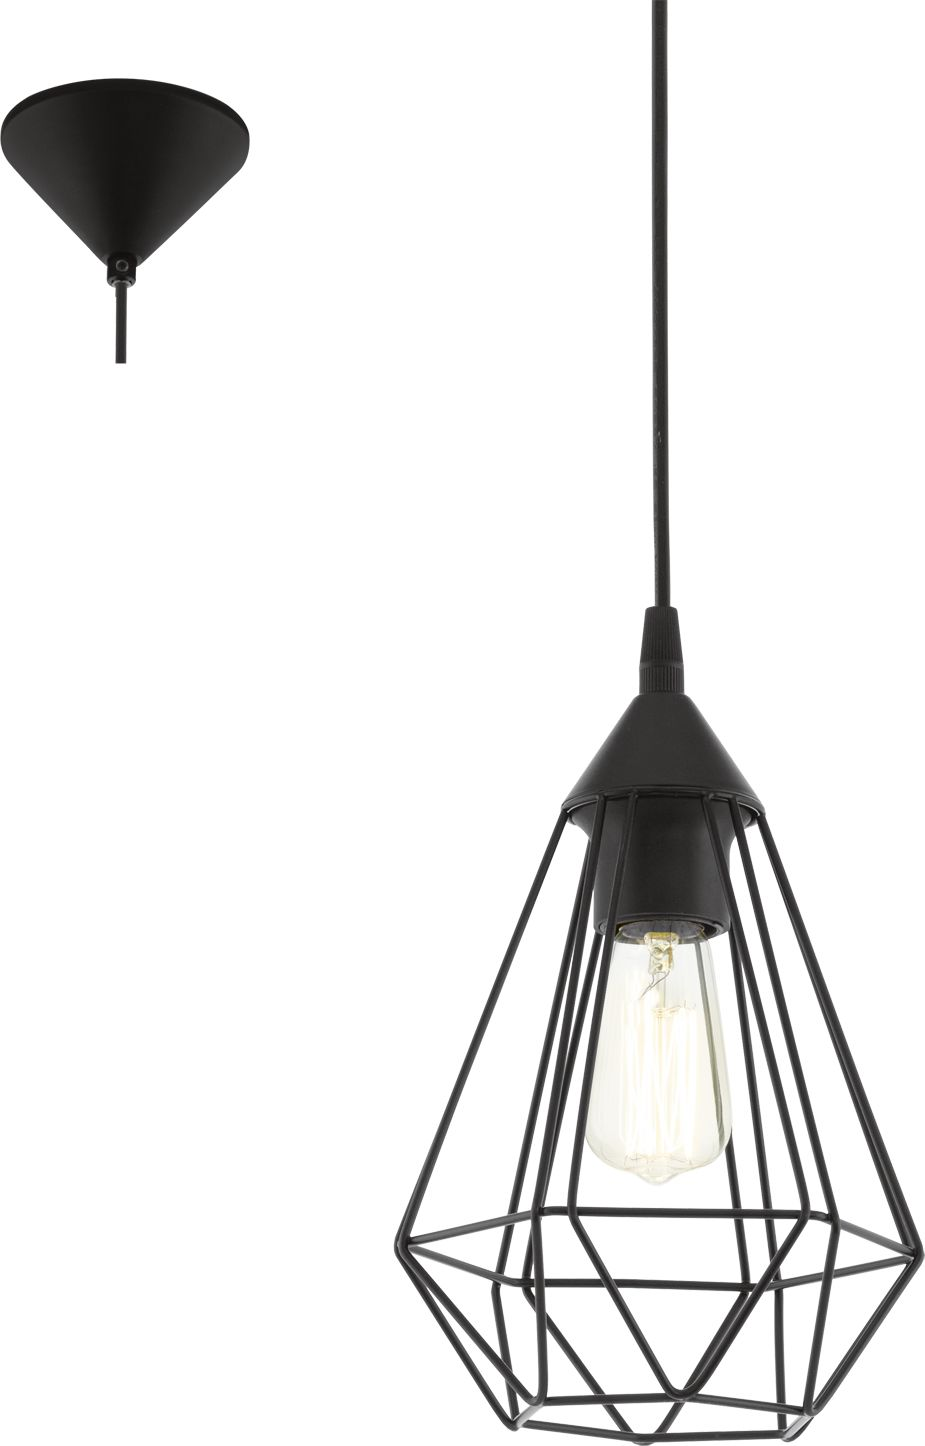 Eglo lampa wisząca Tarbes 94187- SUPER OFERTA - RABAT w koszyku